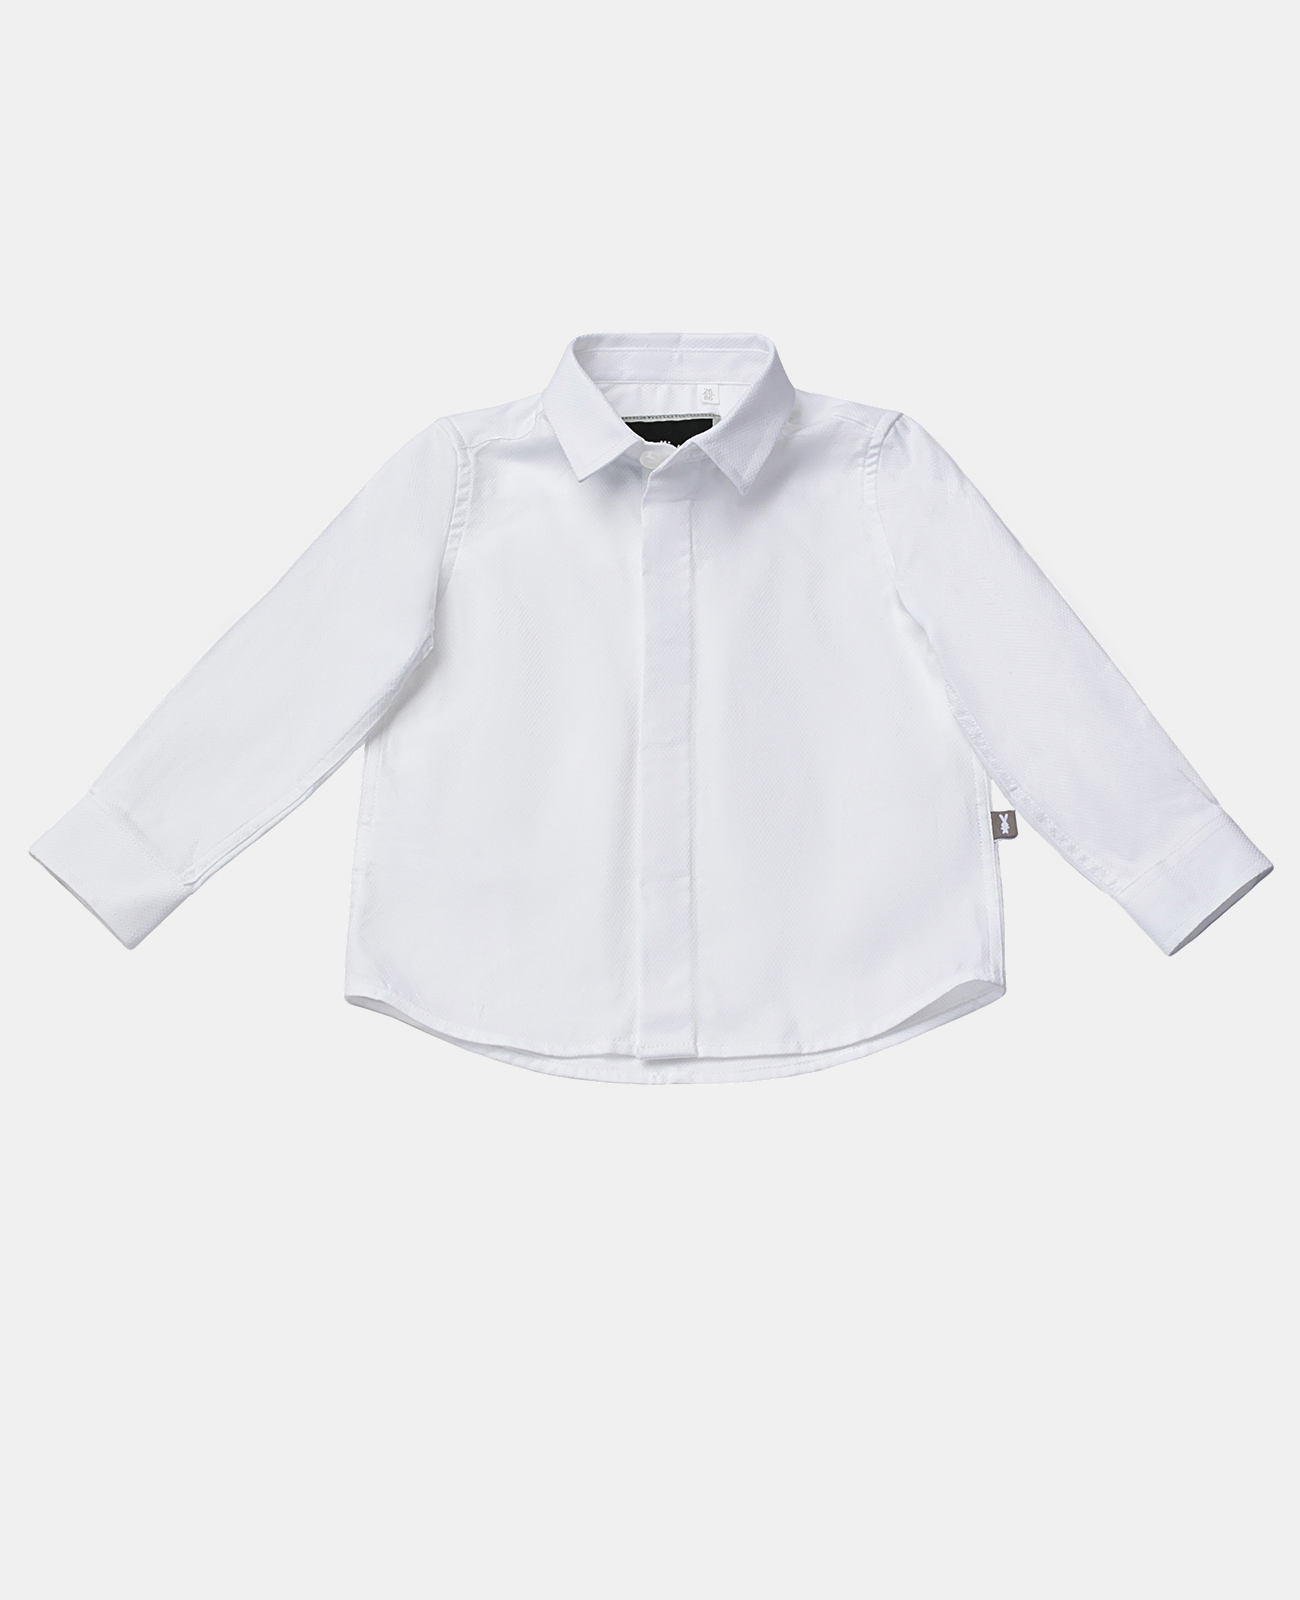 Купить 120GPBBC2301, Белая рубашка Gulliver, Gulliver Baby, белый, 92, Мужской, ОСЕНЬ/ЗИМА 2020-2021 (shop: GulliverMarket Gulliver Market)